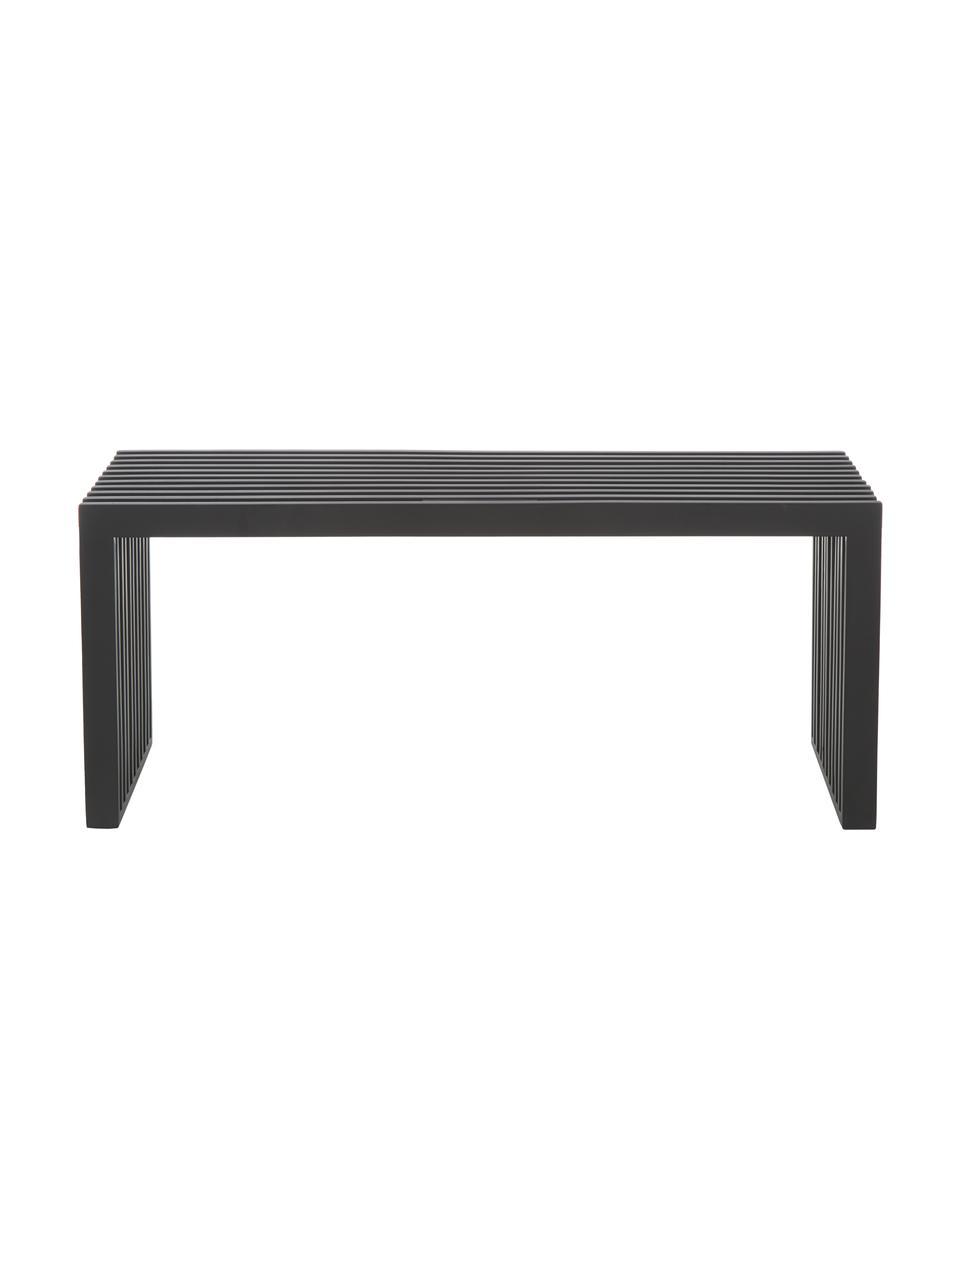 Sitzbank Rib in Schwarz aus Massivholz, Mahagoniholz, lackiert, Schwarz, 104 x 43 cm